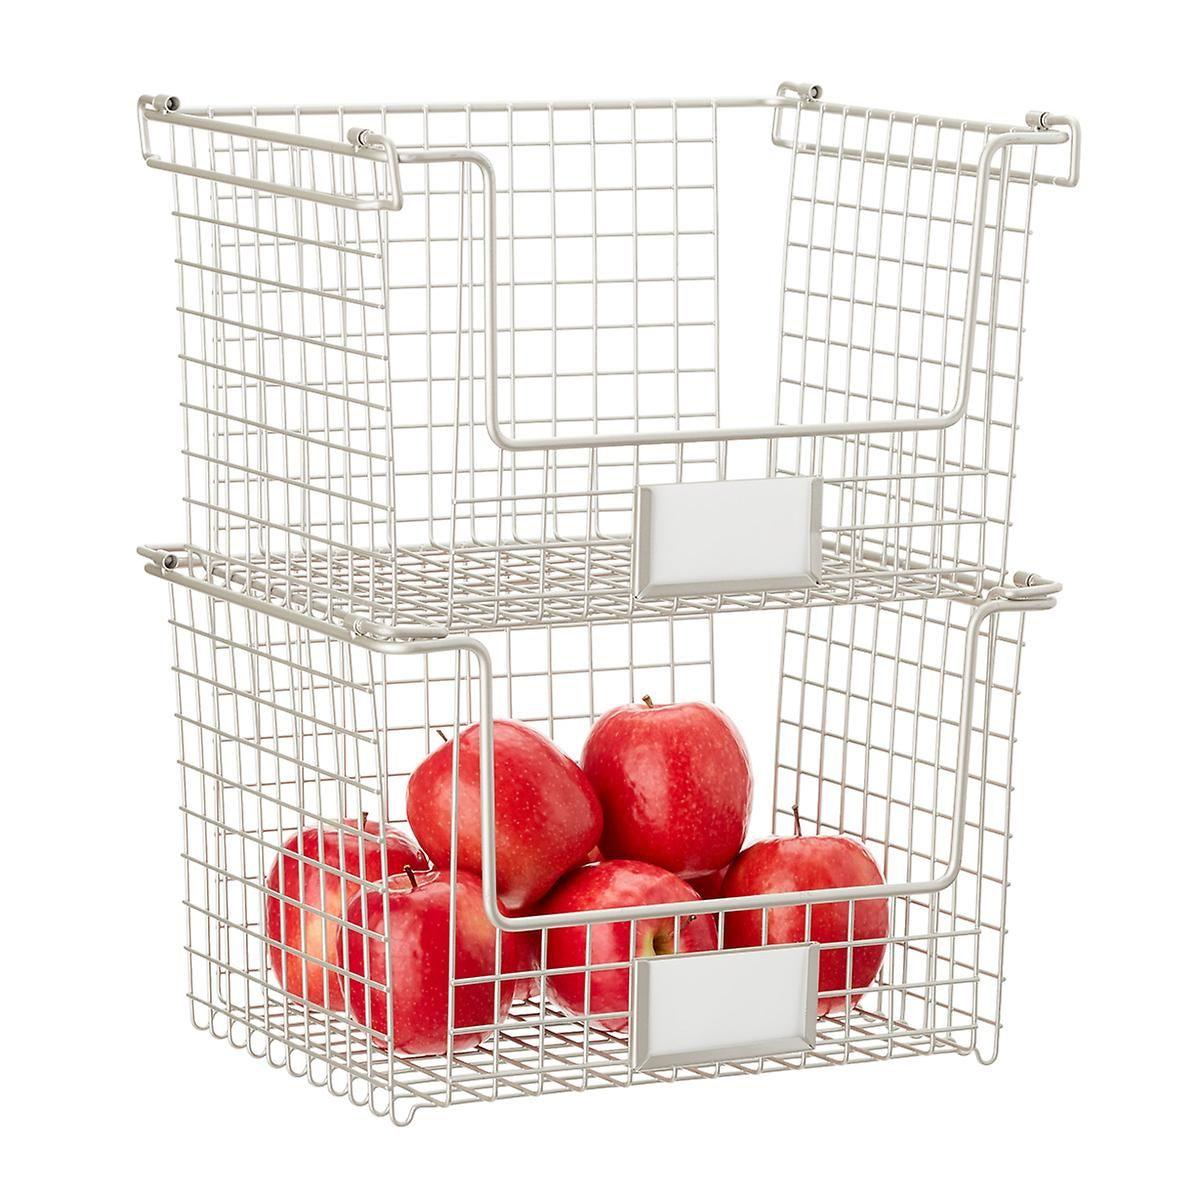 Idesign Nickel Stackable Basket Stackable Baskets Pantry Organizers Basket